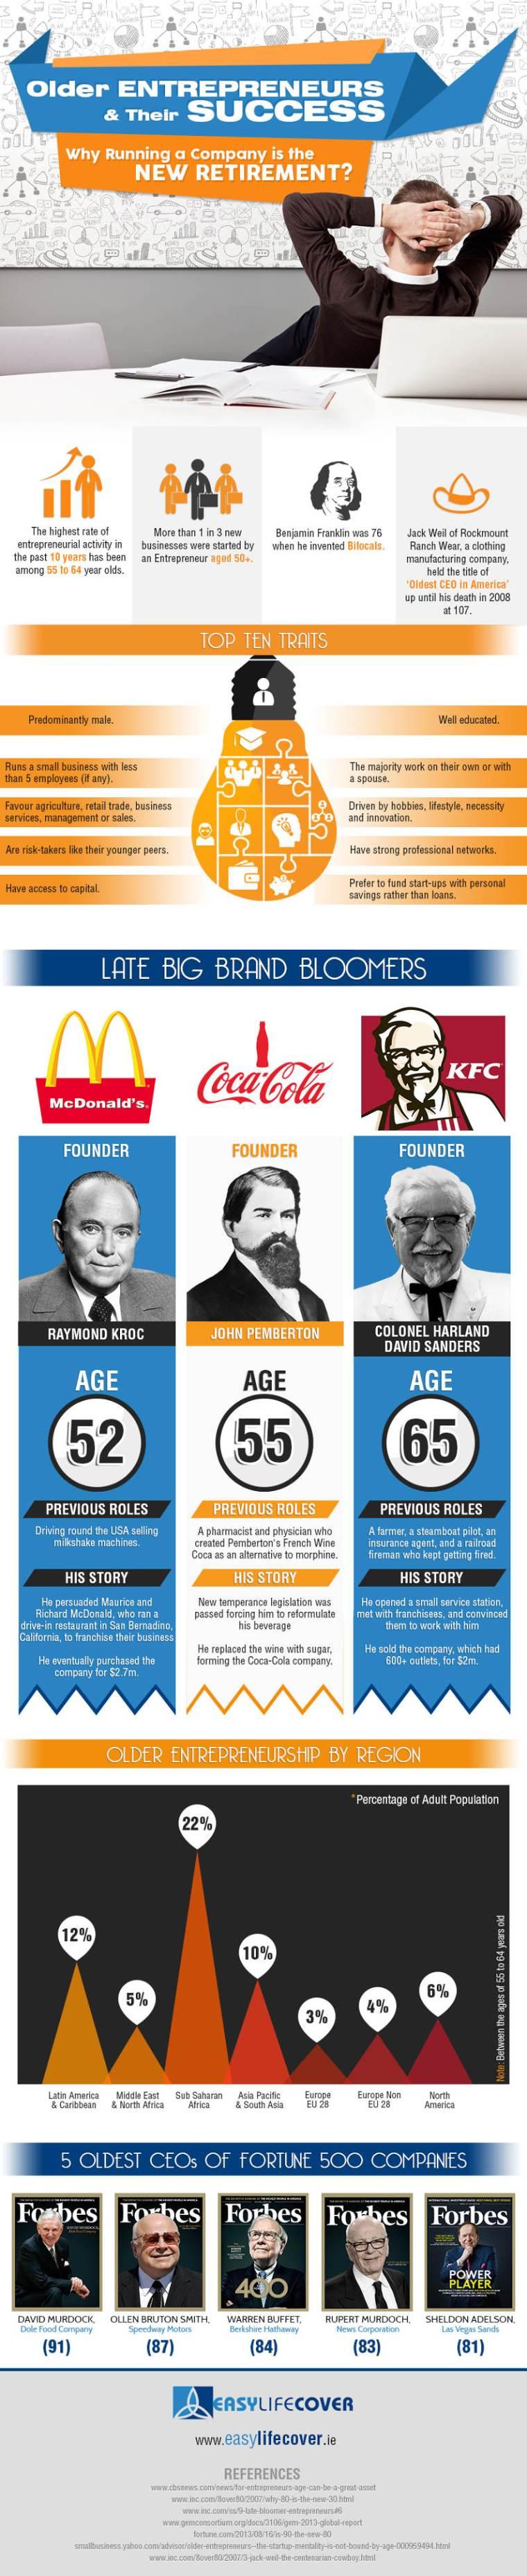 Entrepreneurship is the new retirement infographic